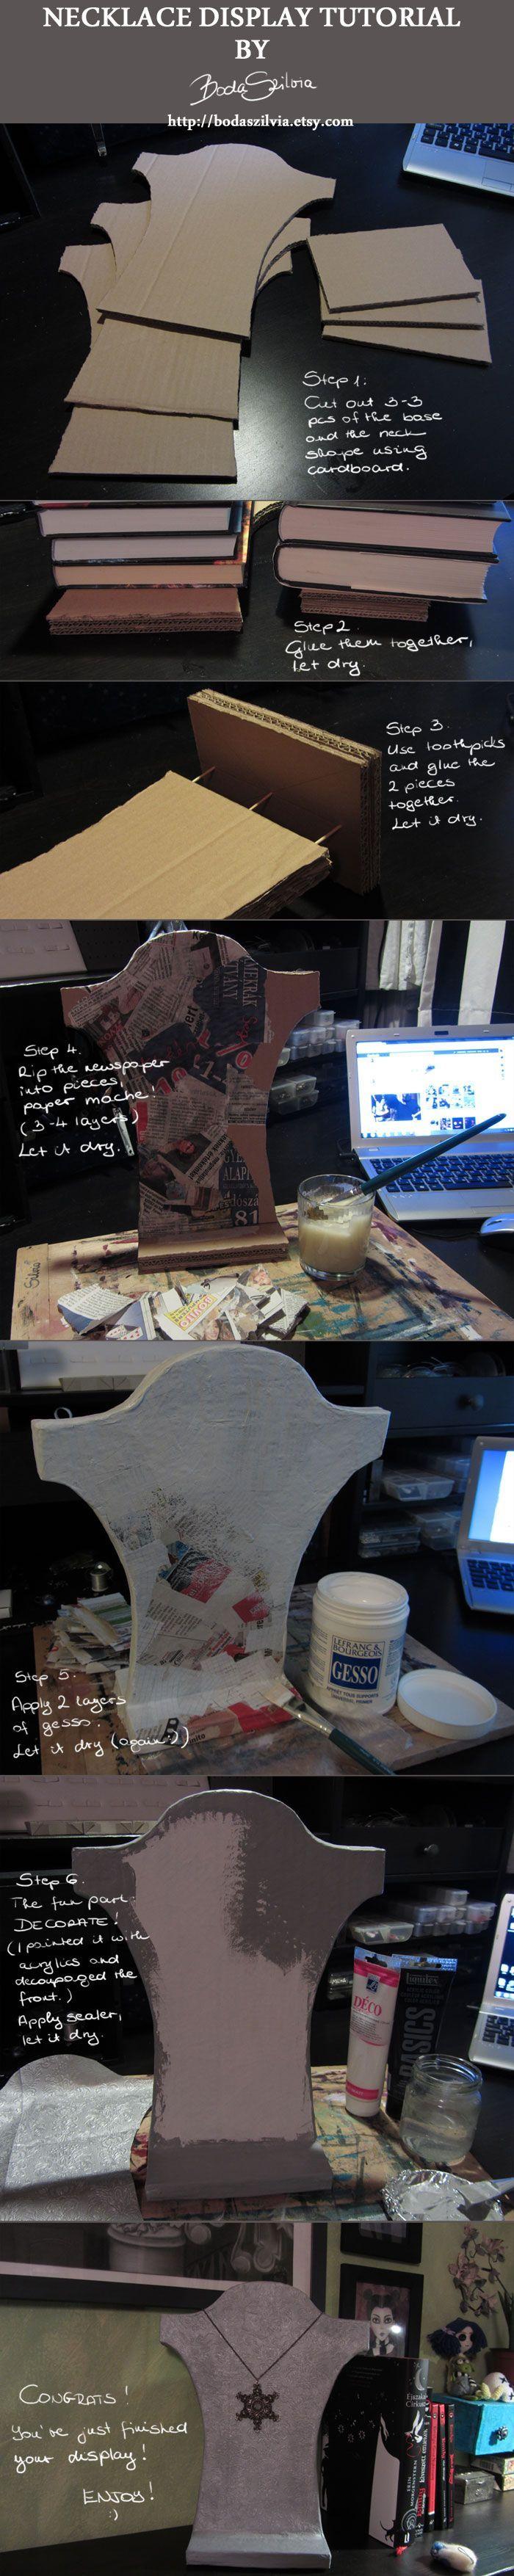 Necklace display tutorial by http://bodaszilvia.deviantart.com    (home made paper mache glue recipe included in the description :) )